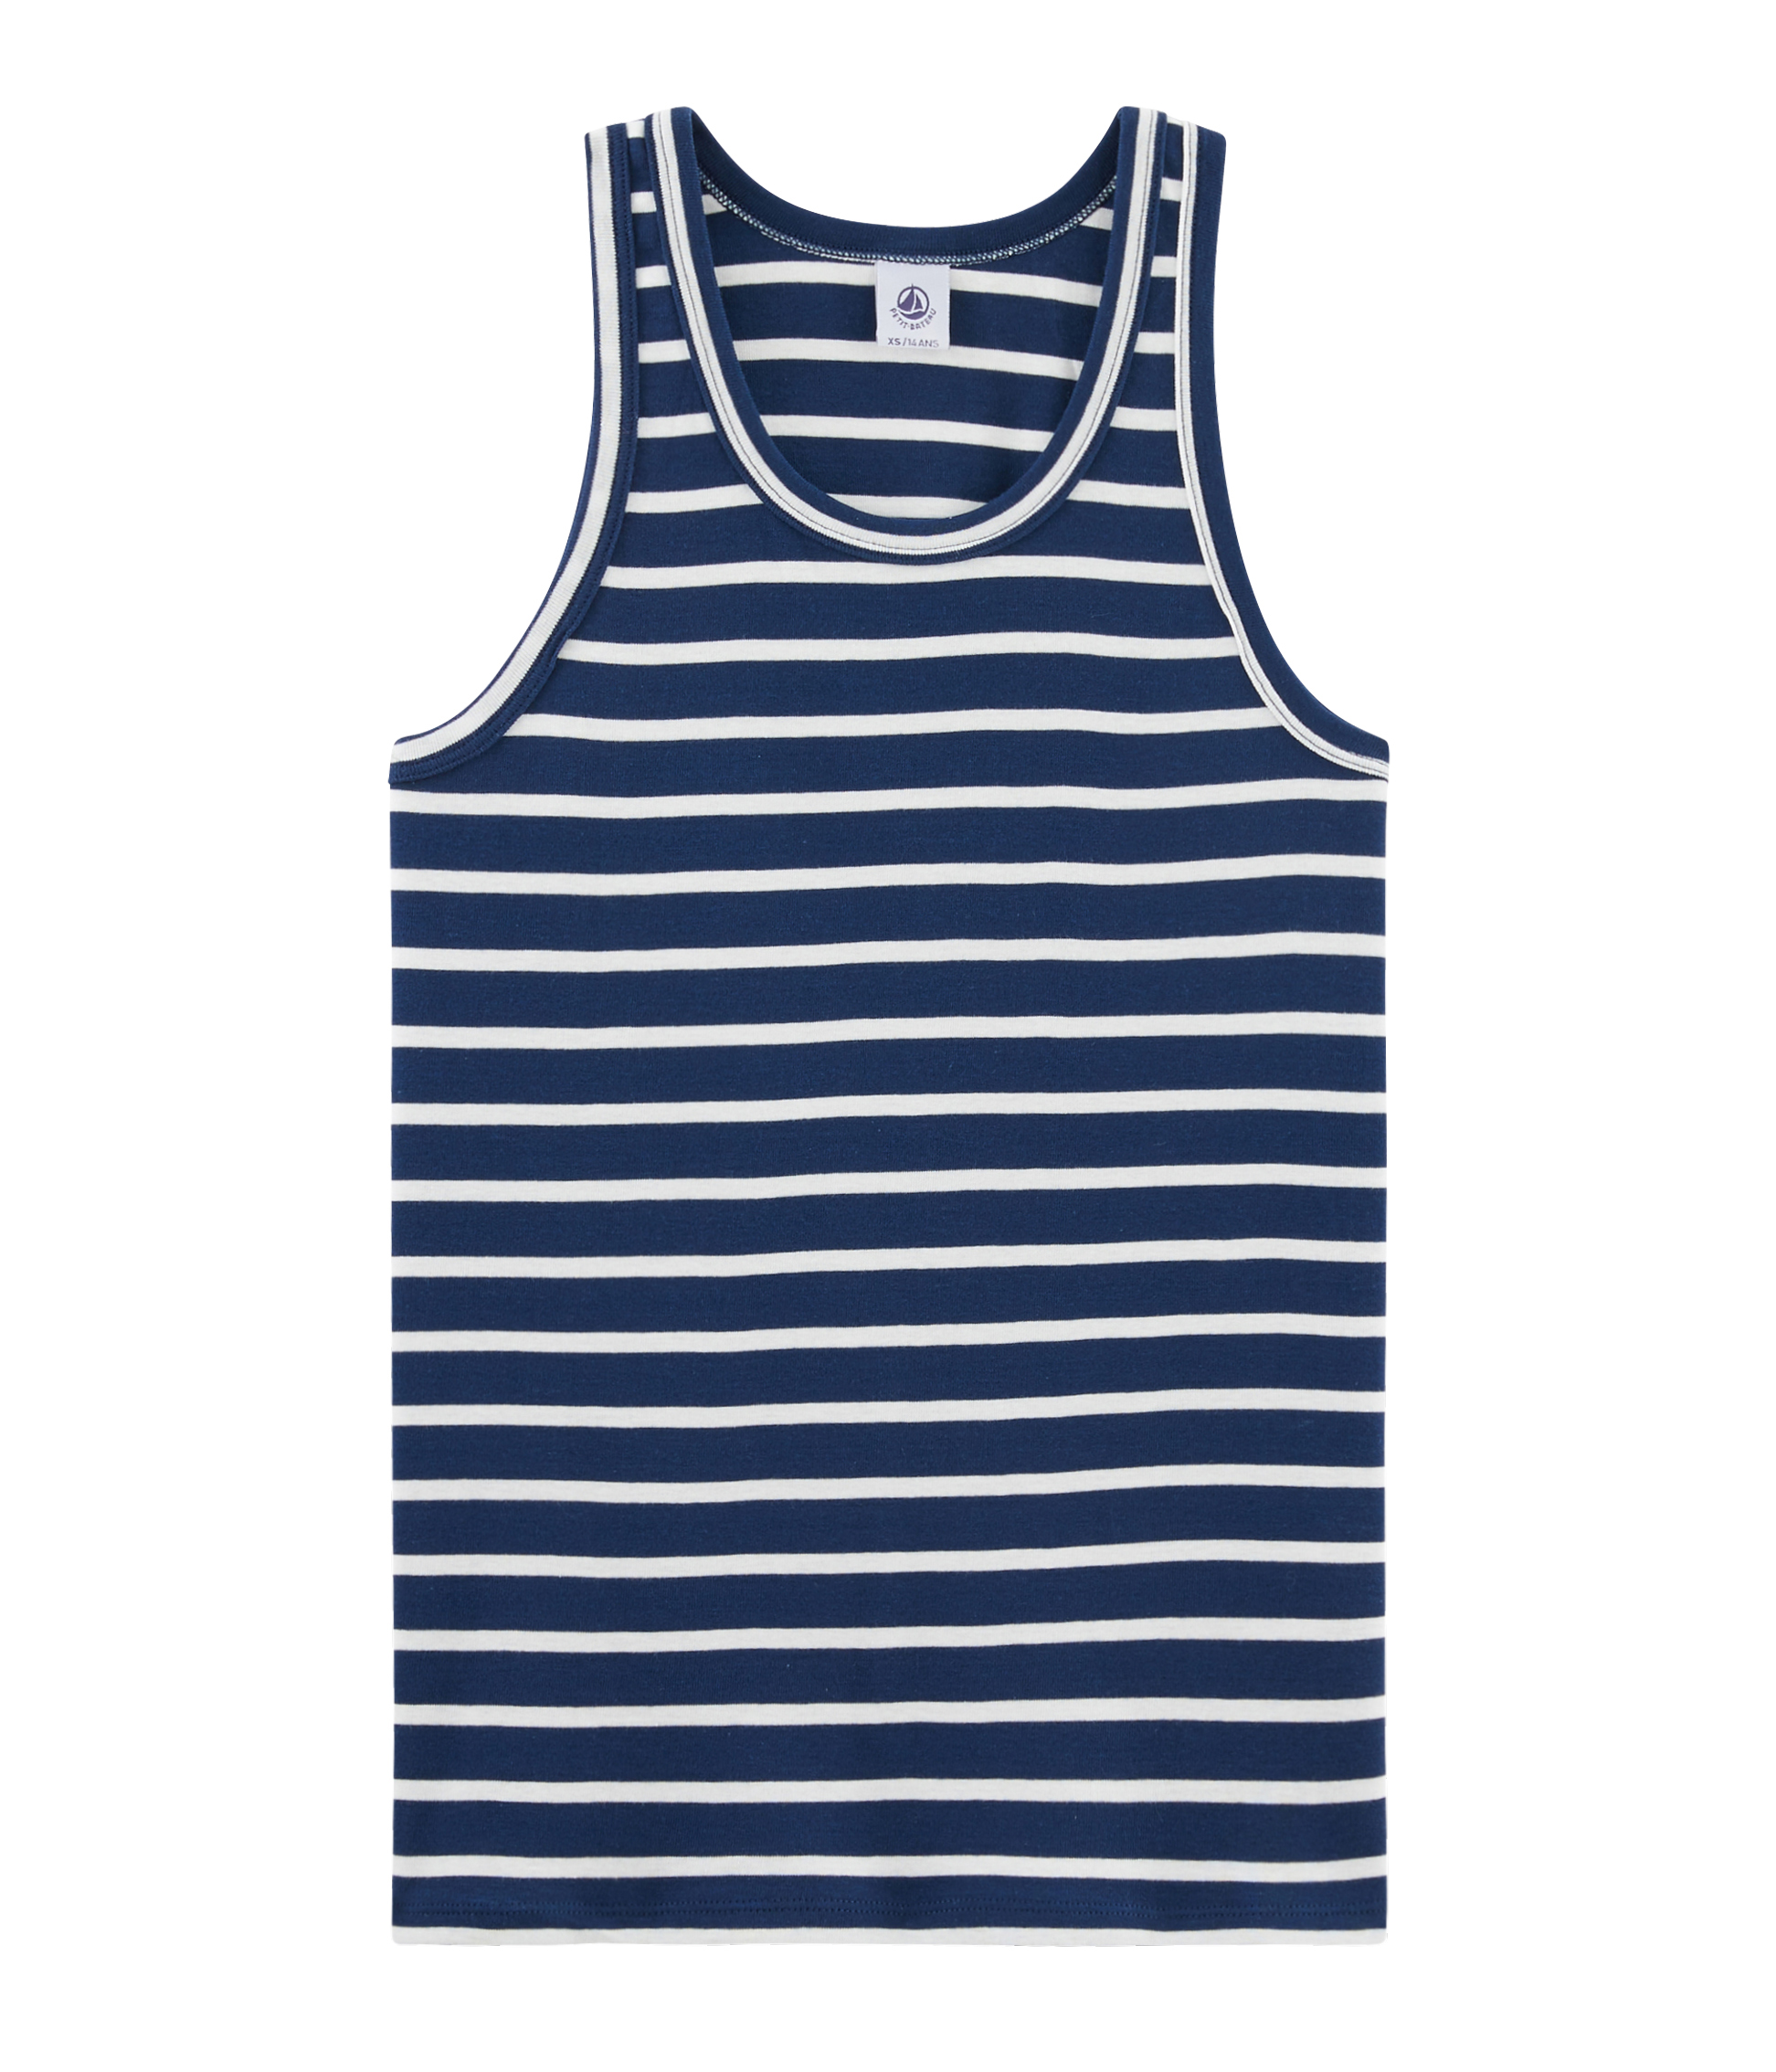 Blue//White-6 Years Petit Bateau 2 Pack Tank Tops Toddler//Kid